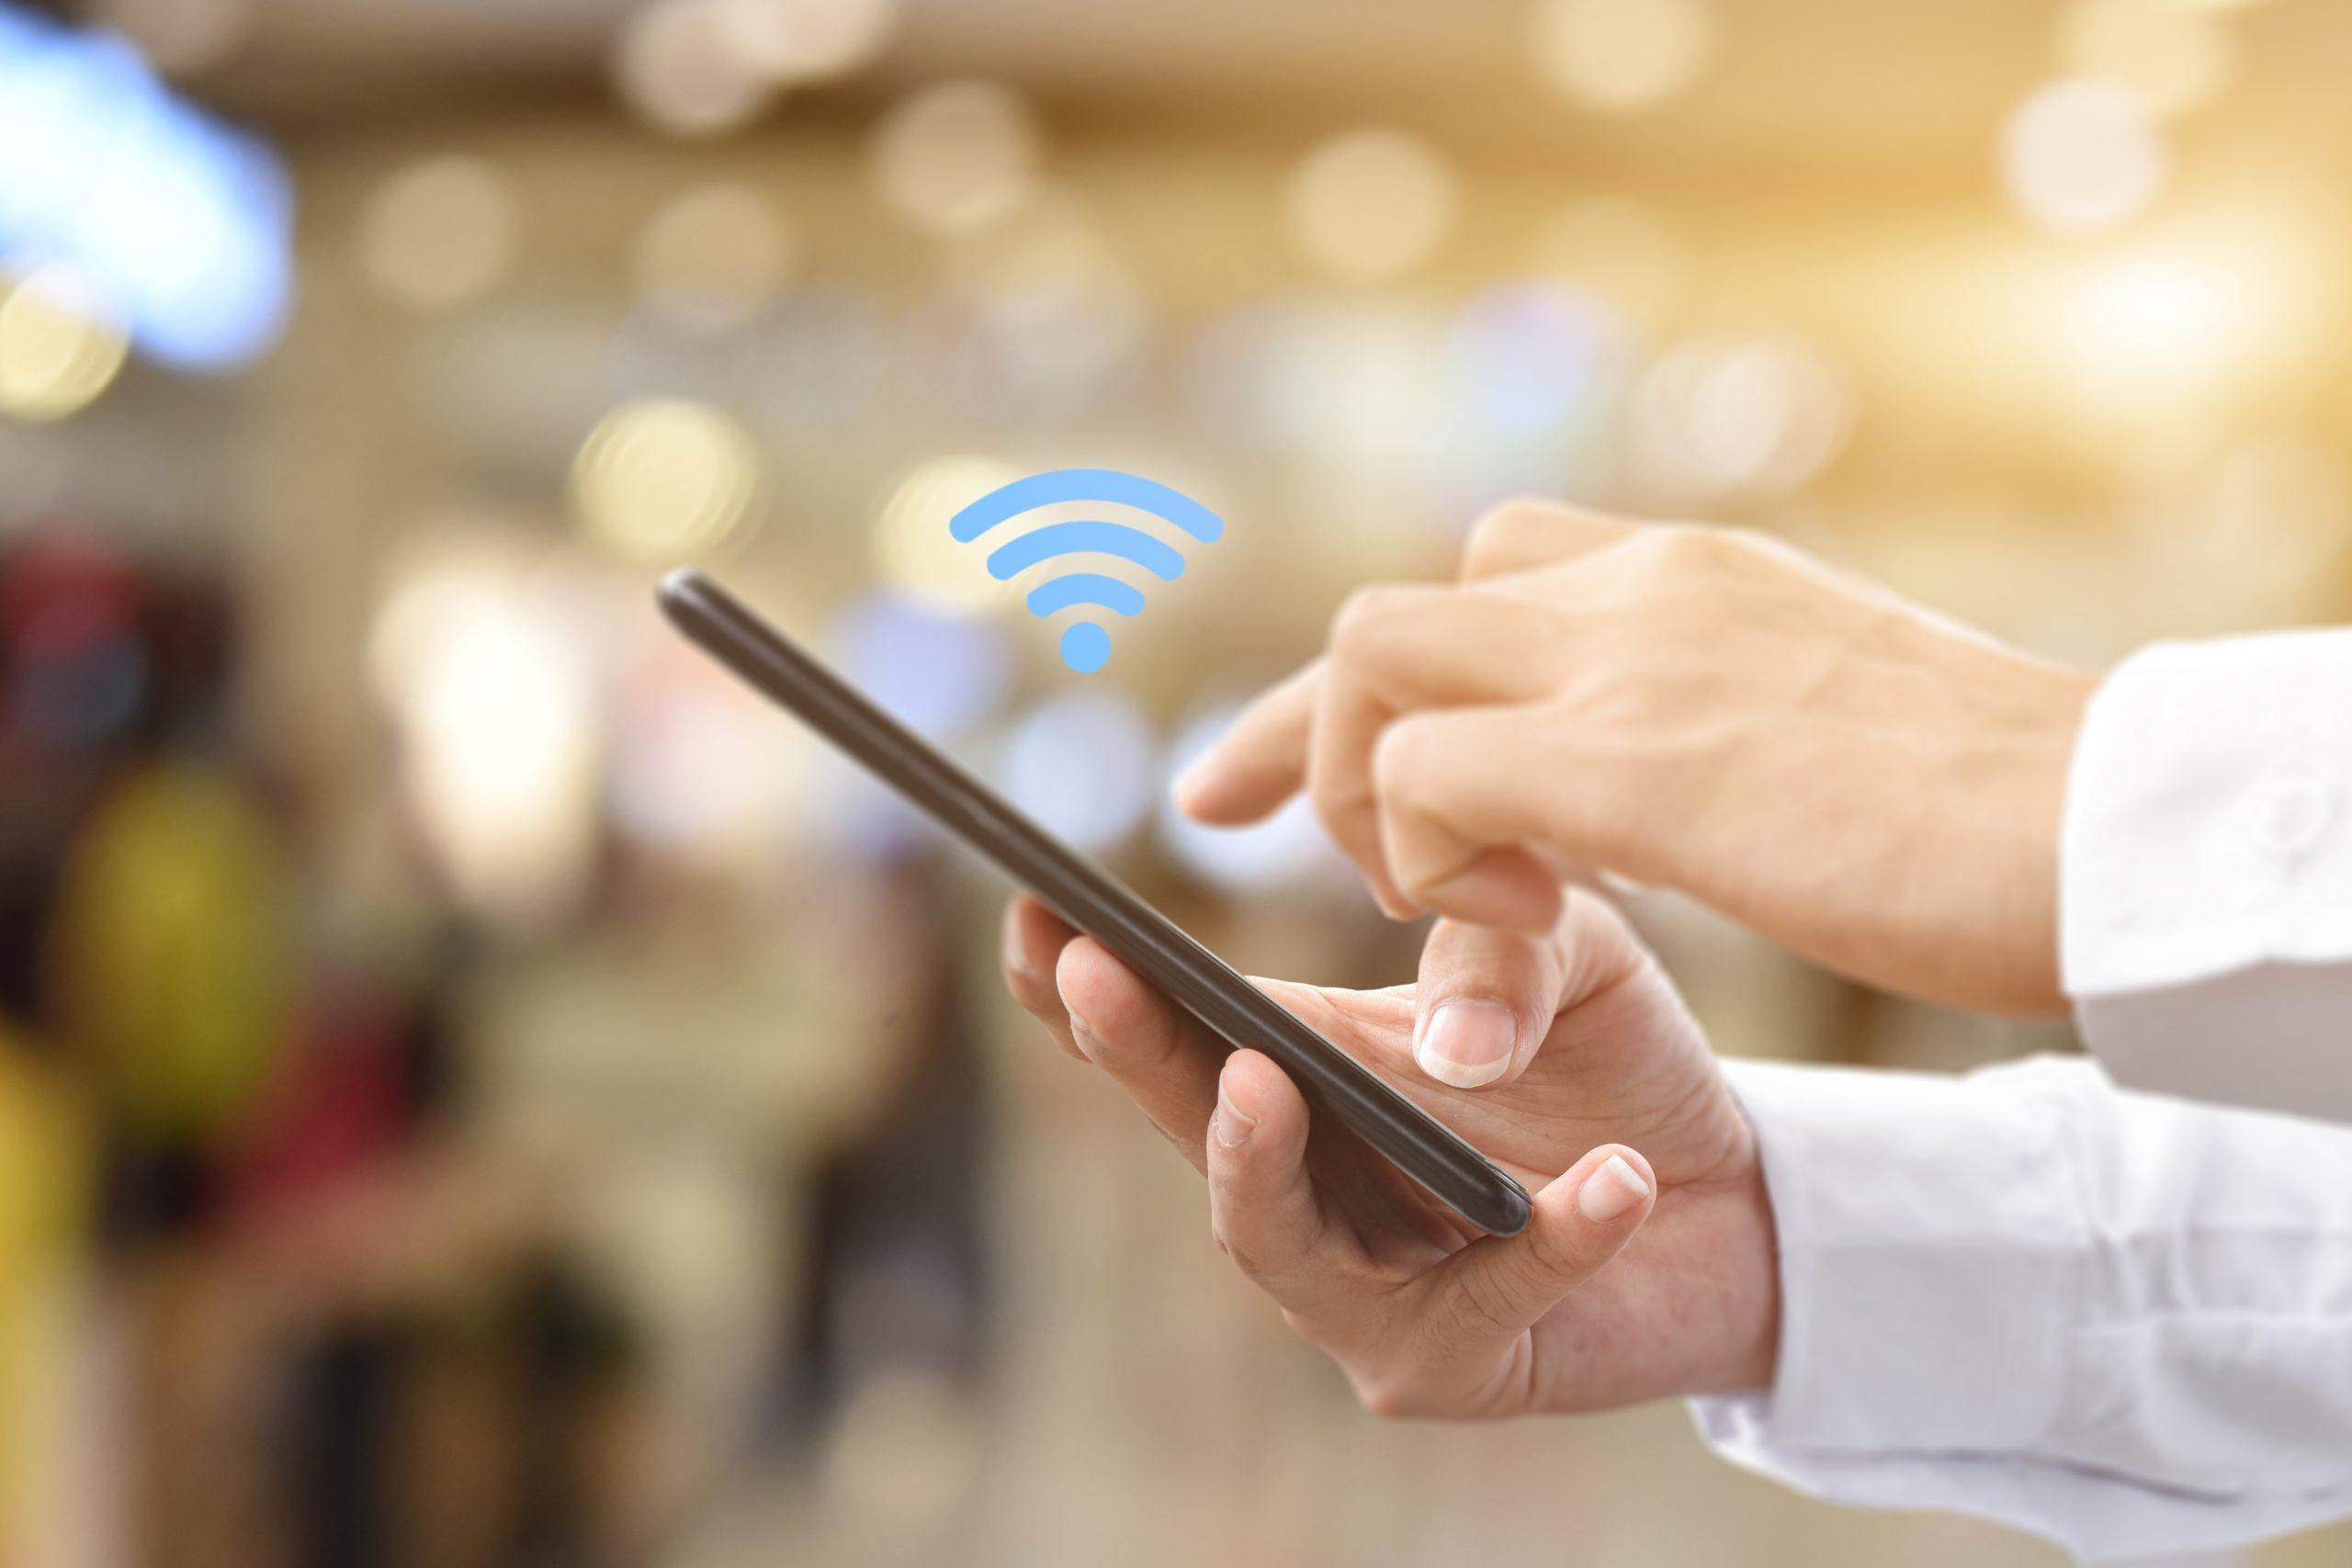 wifi-as-a-service wifi as a service Wifi as a Service wifi as a service red scaled